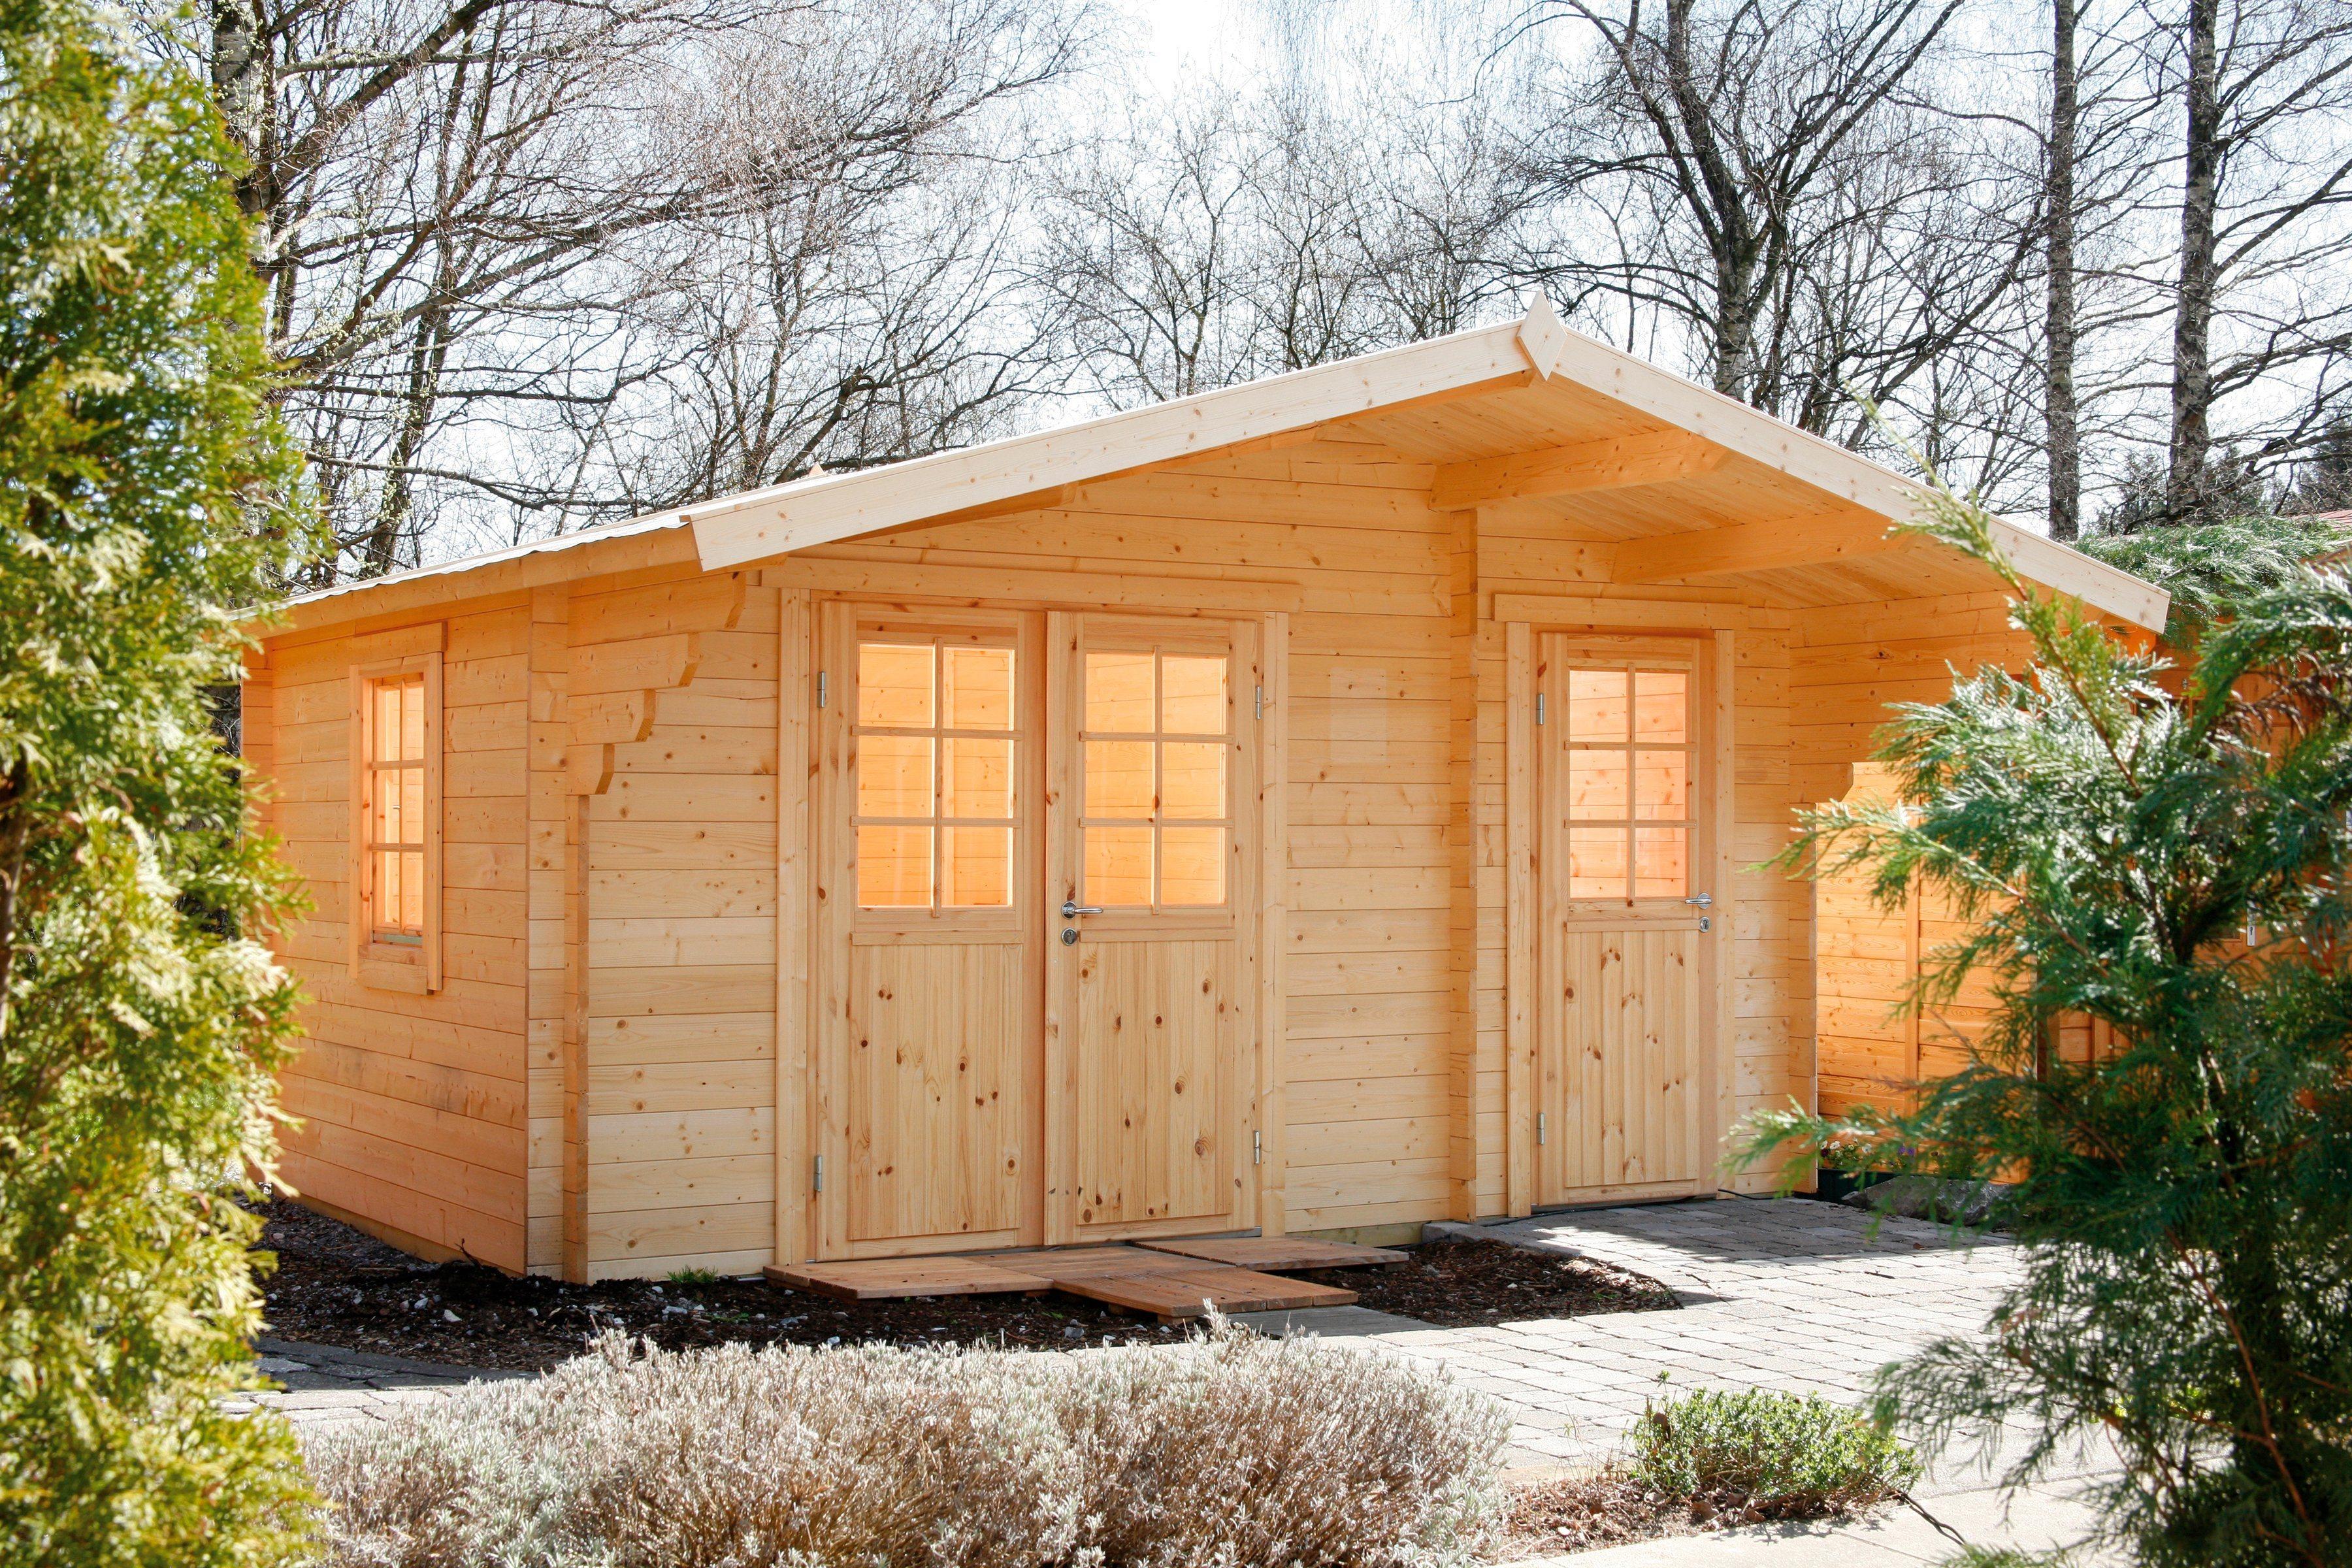 WOLFF Gartenhaus »Caro 34 Klassik«, BxT: 486x460 cm | Garten > Gartenhäuser | Wolff